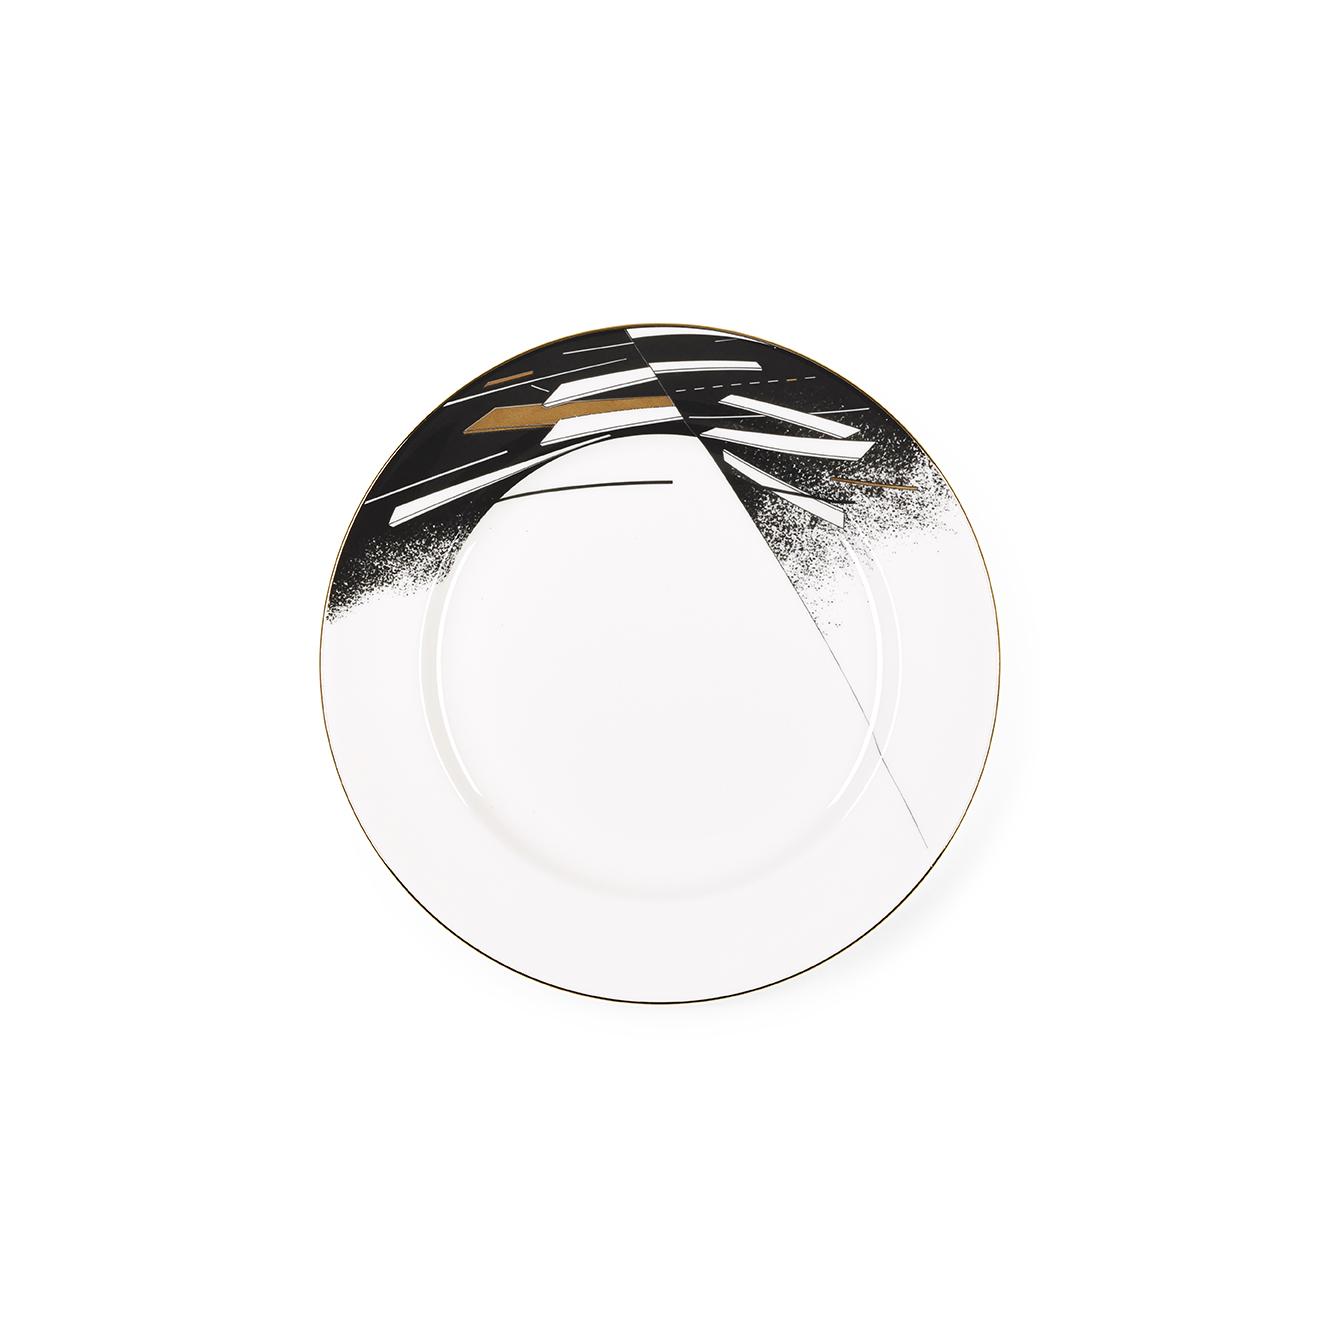 Dinner Plates: Have A Sneak Peek At Modern Dinner Plates